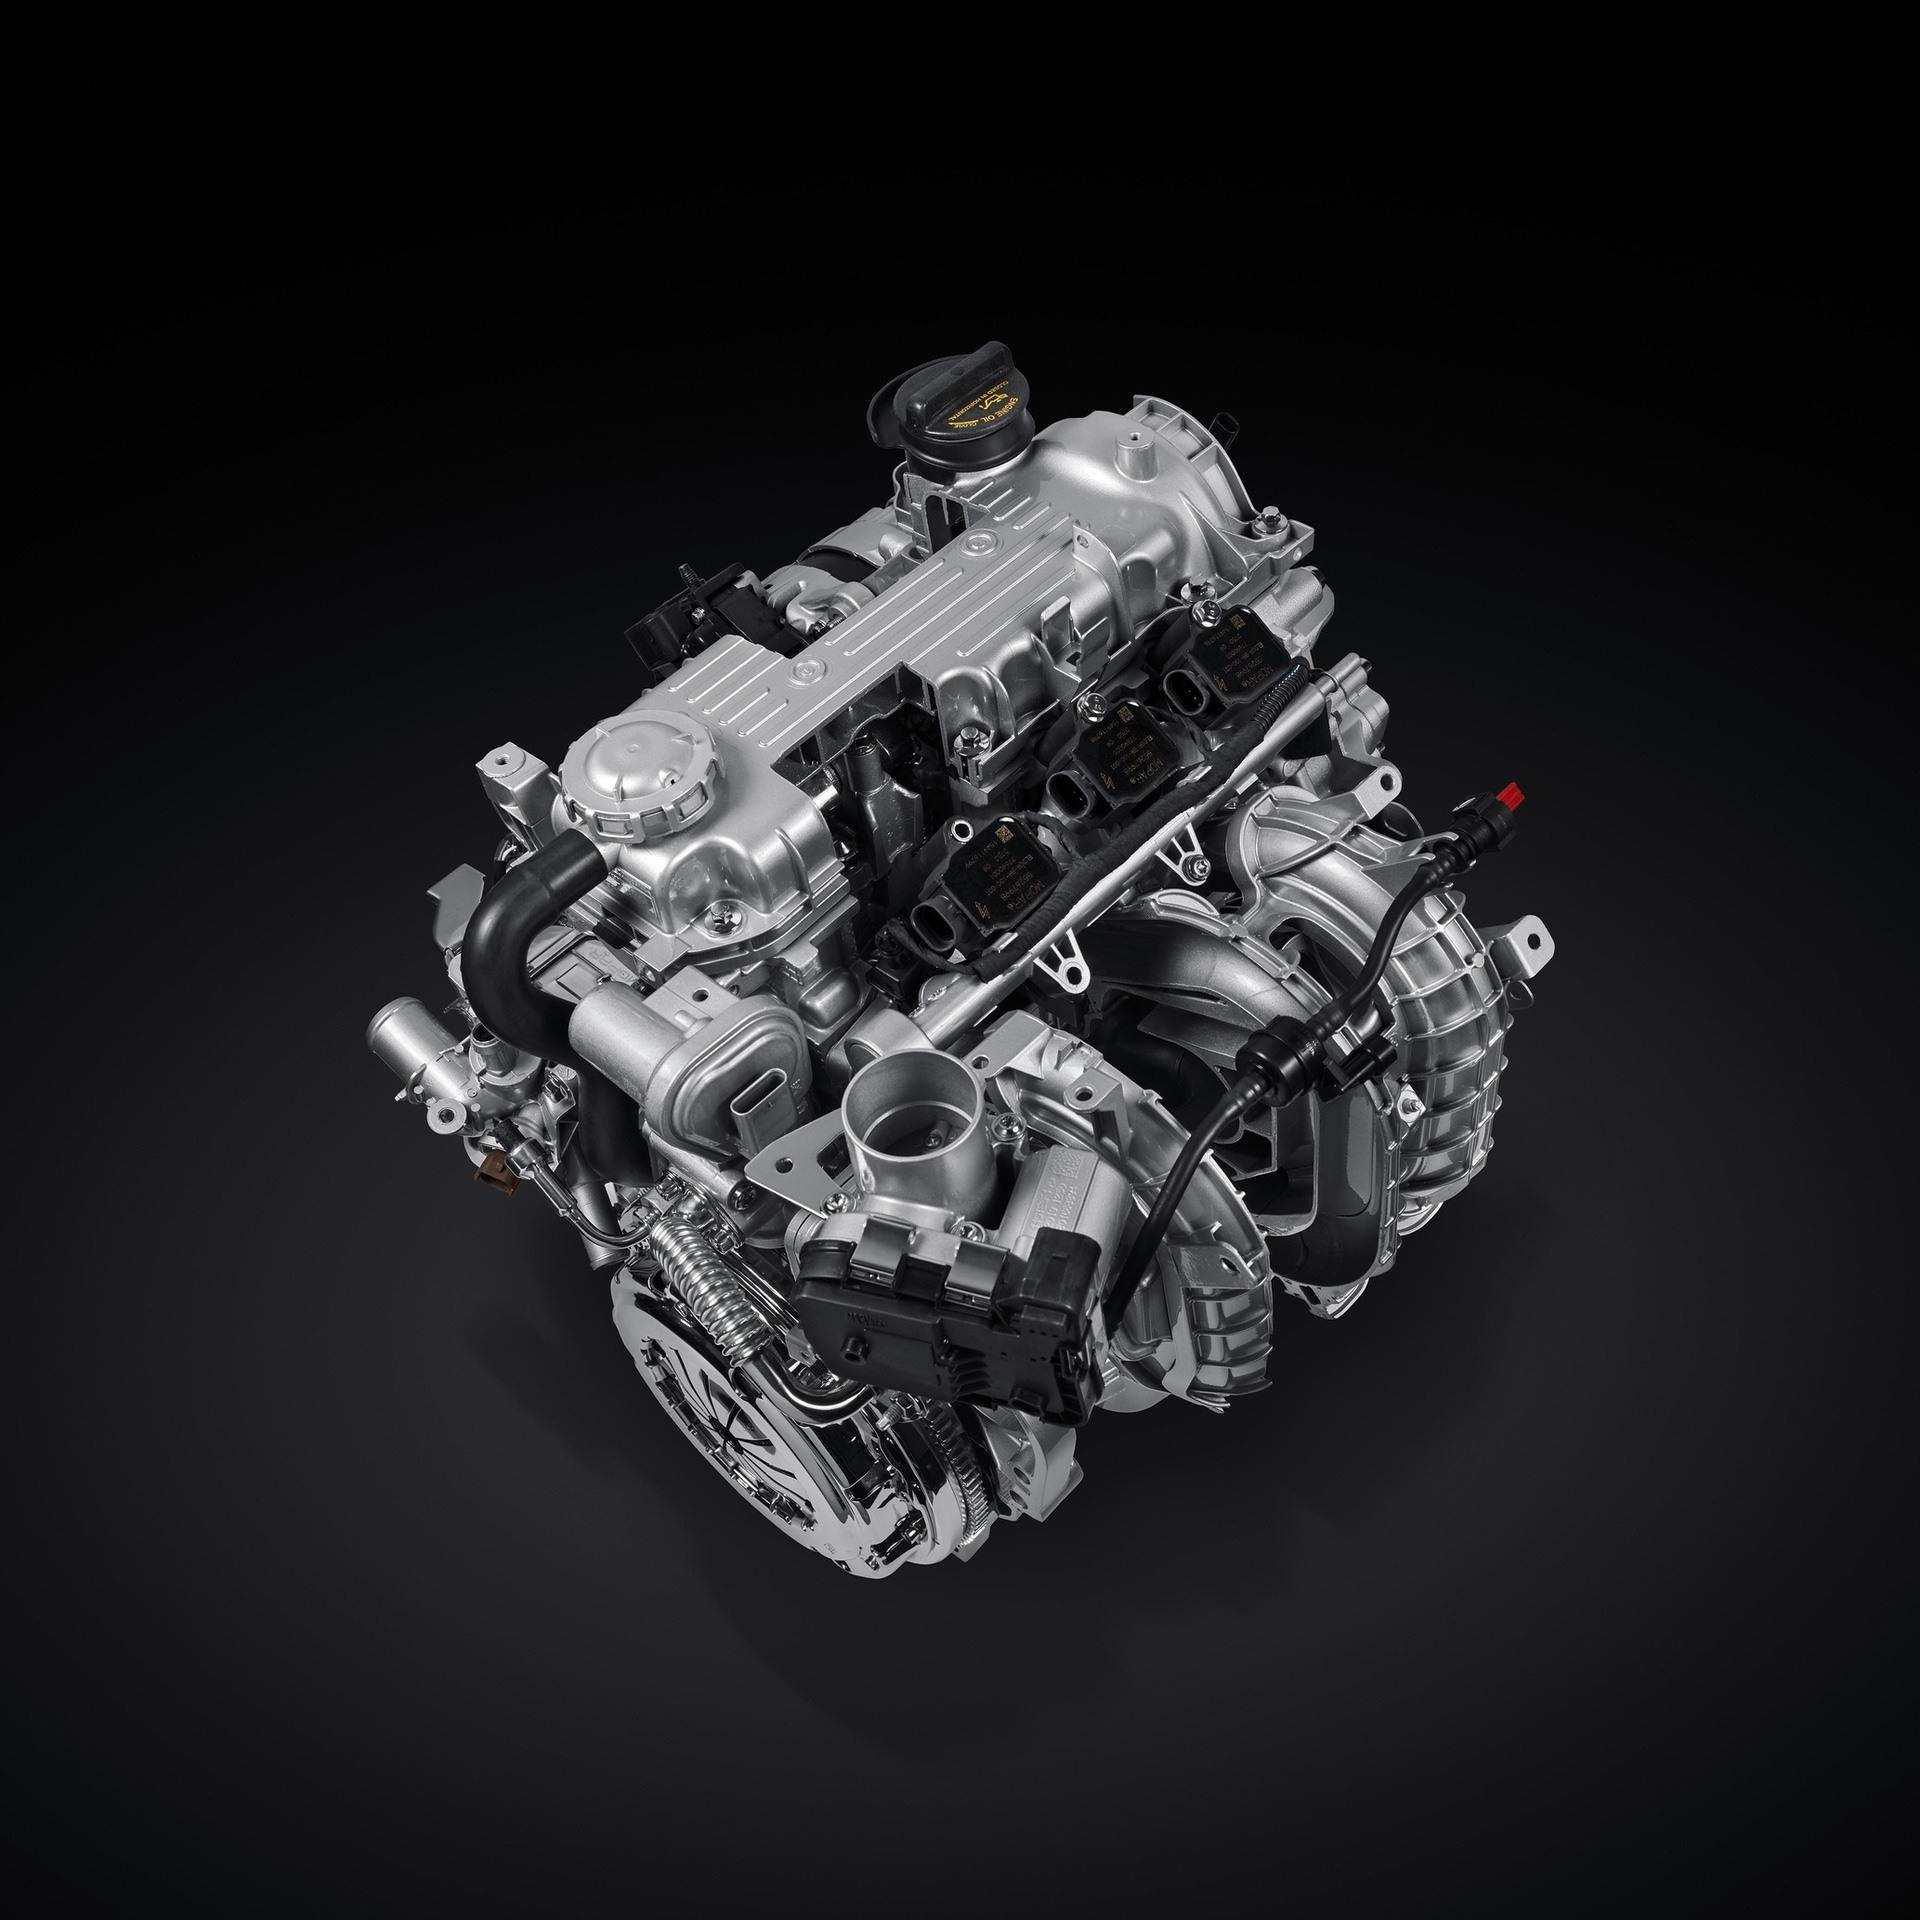 200108_Fiat_Mild-Hybrid-Engine_18